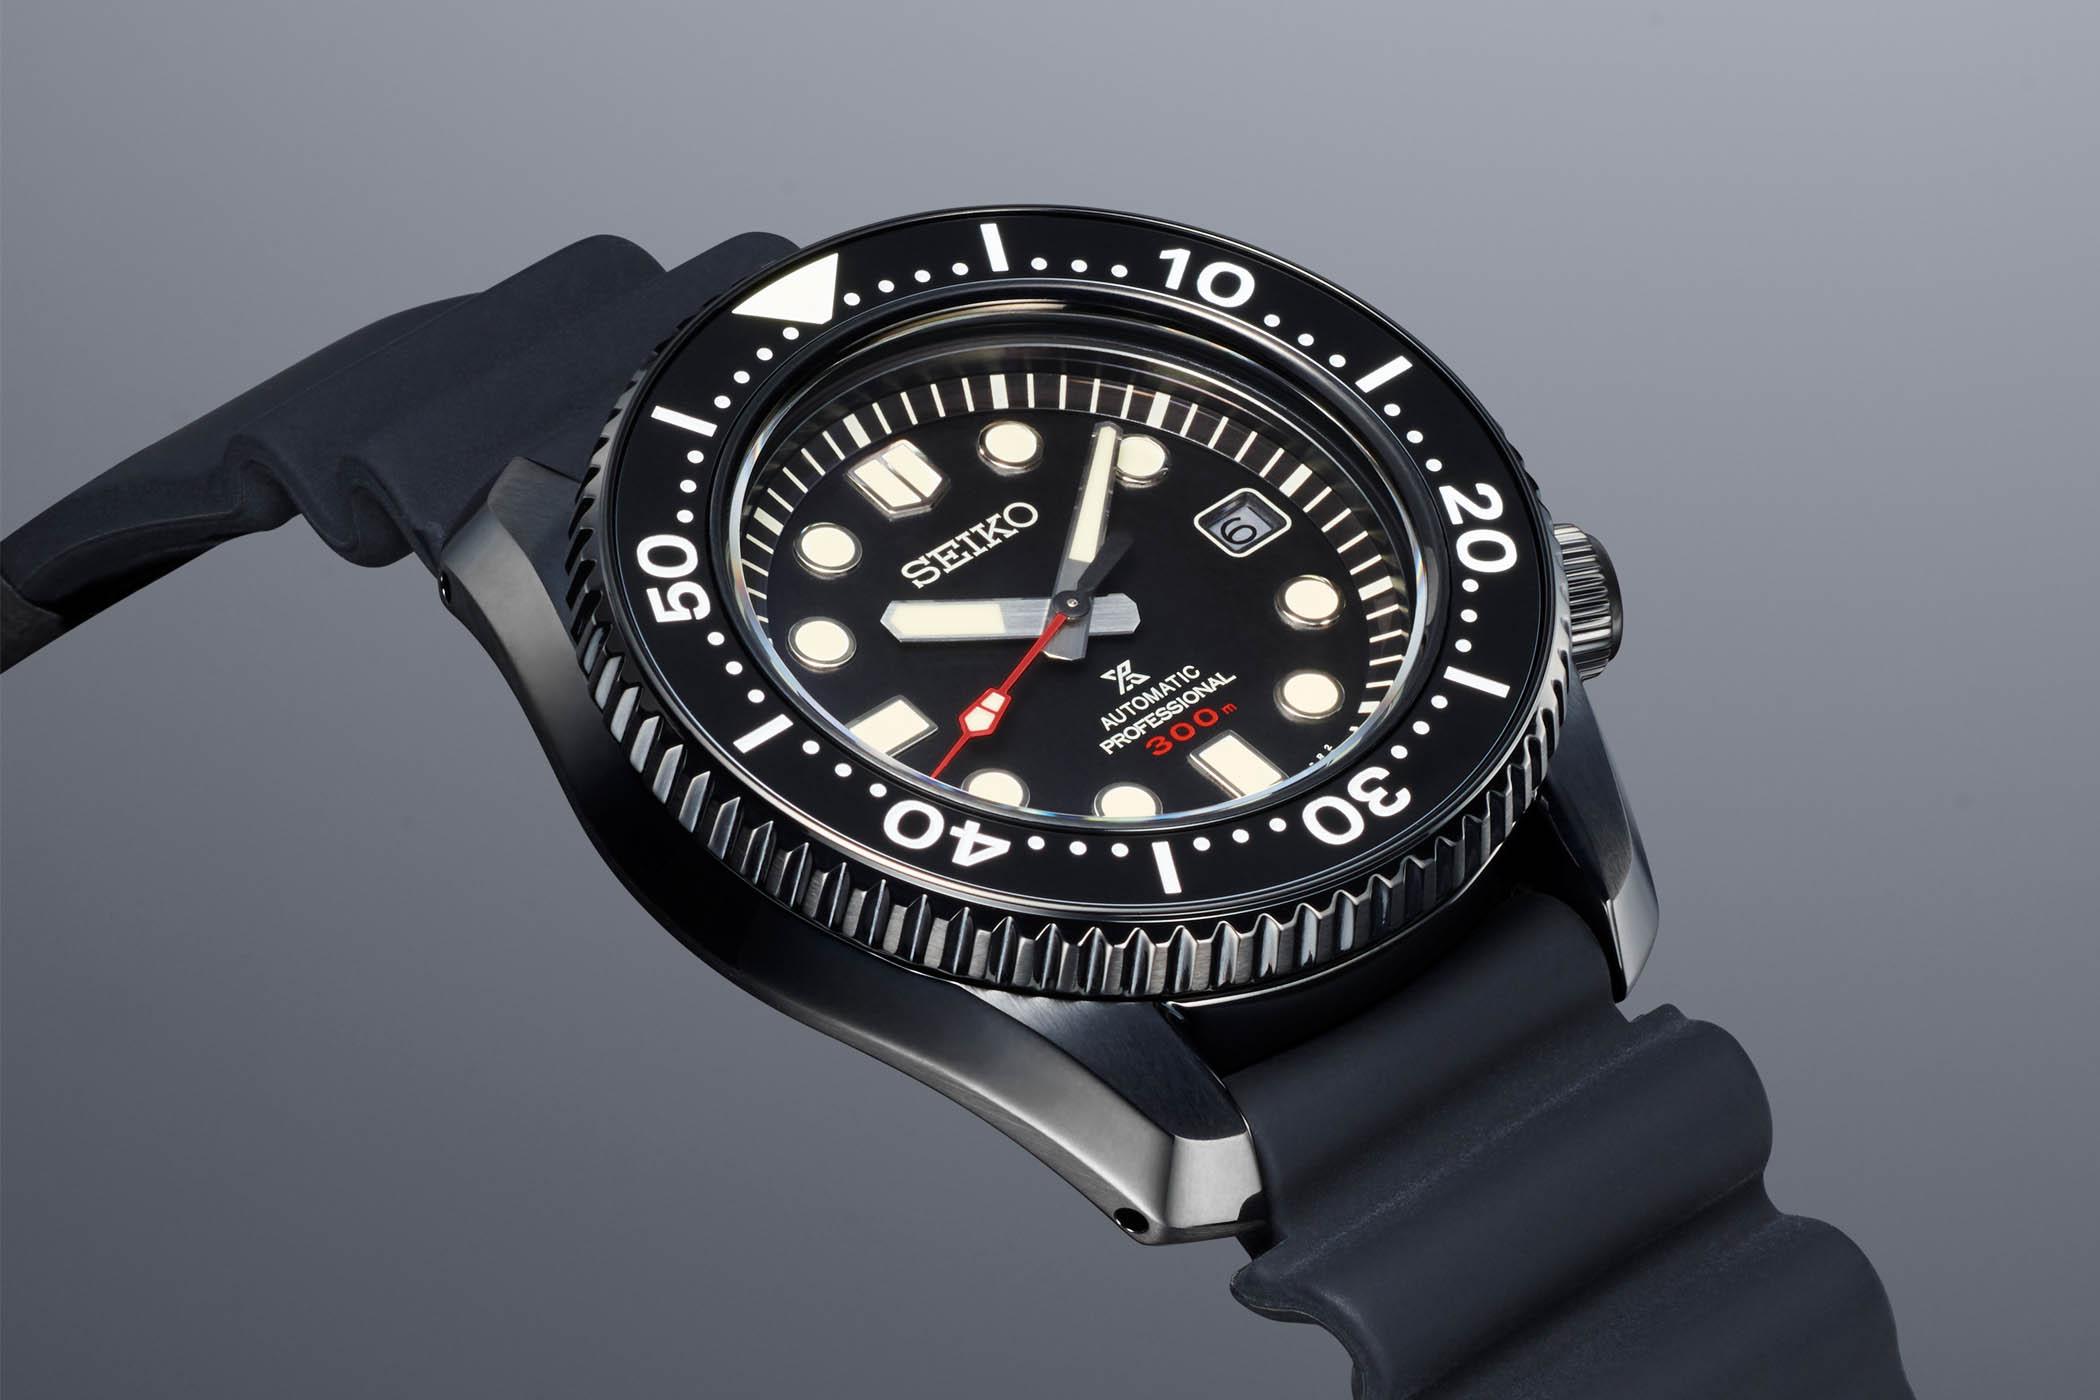 Seiko Prospex Black Series Limited Edition SLA035J1